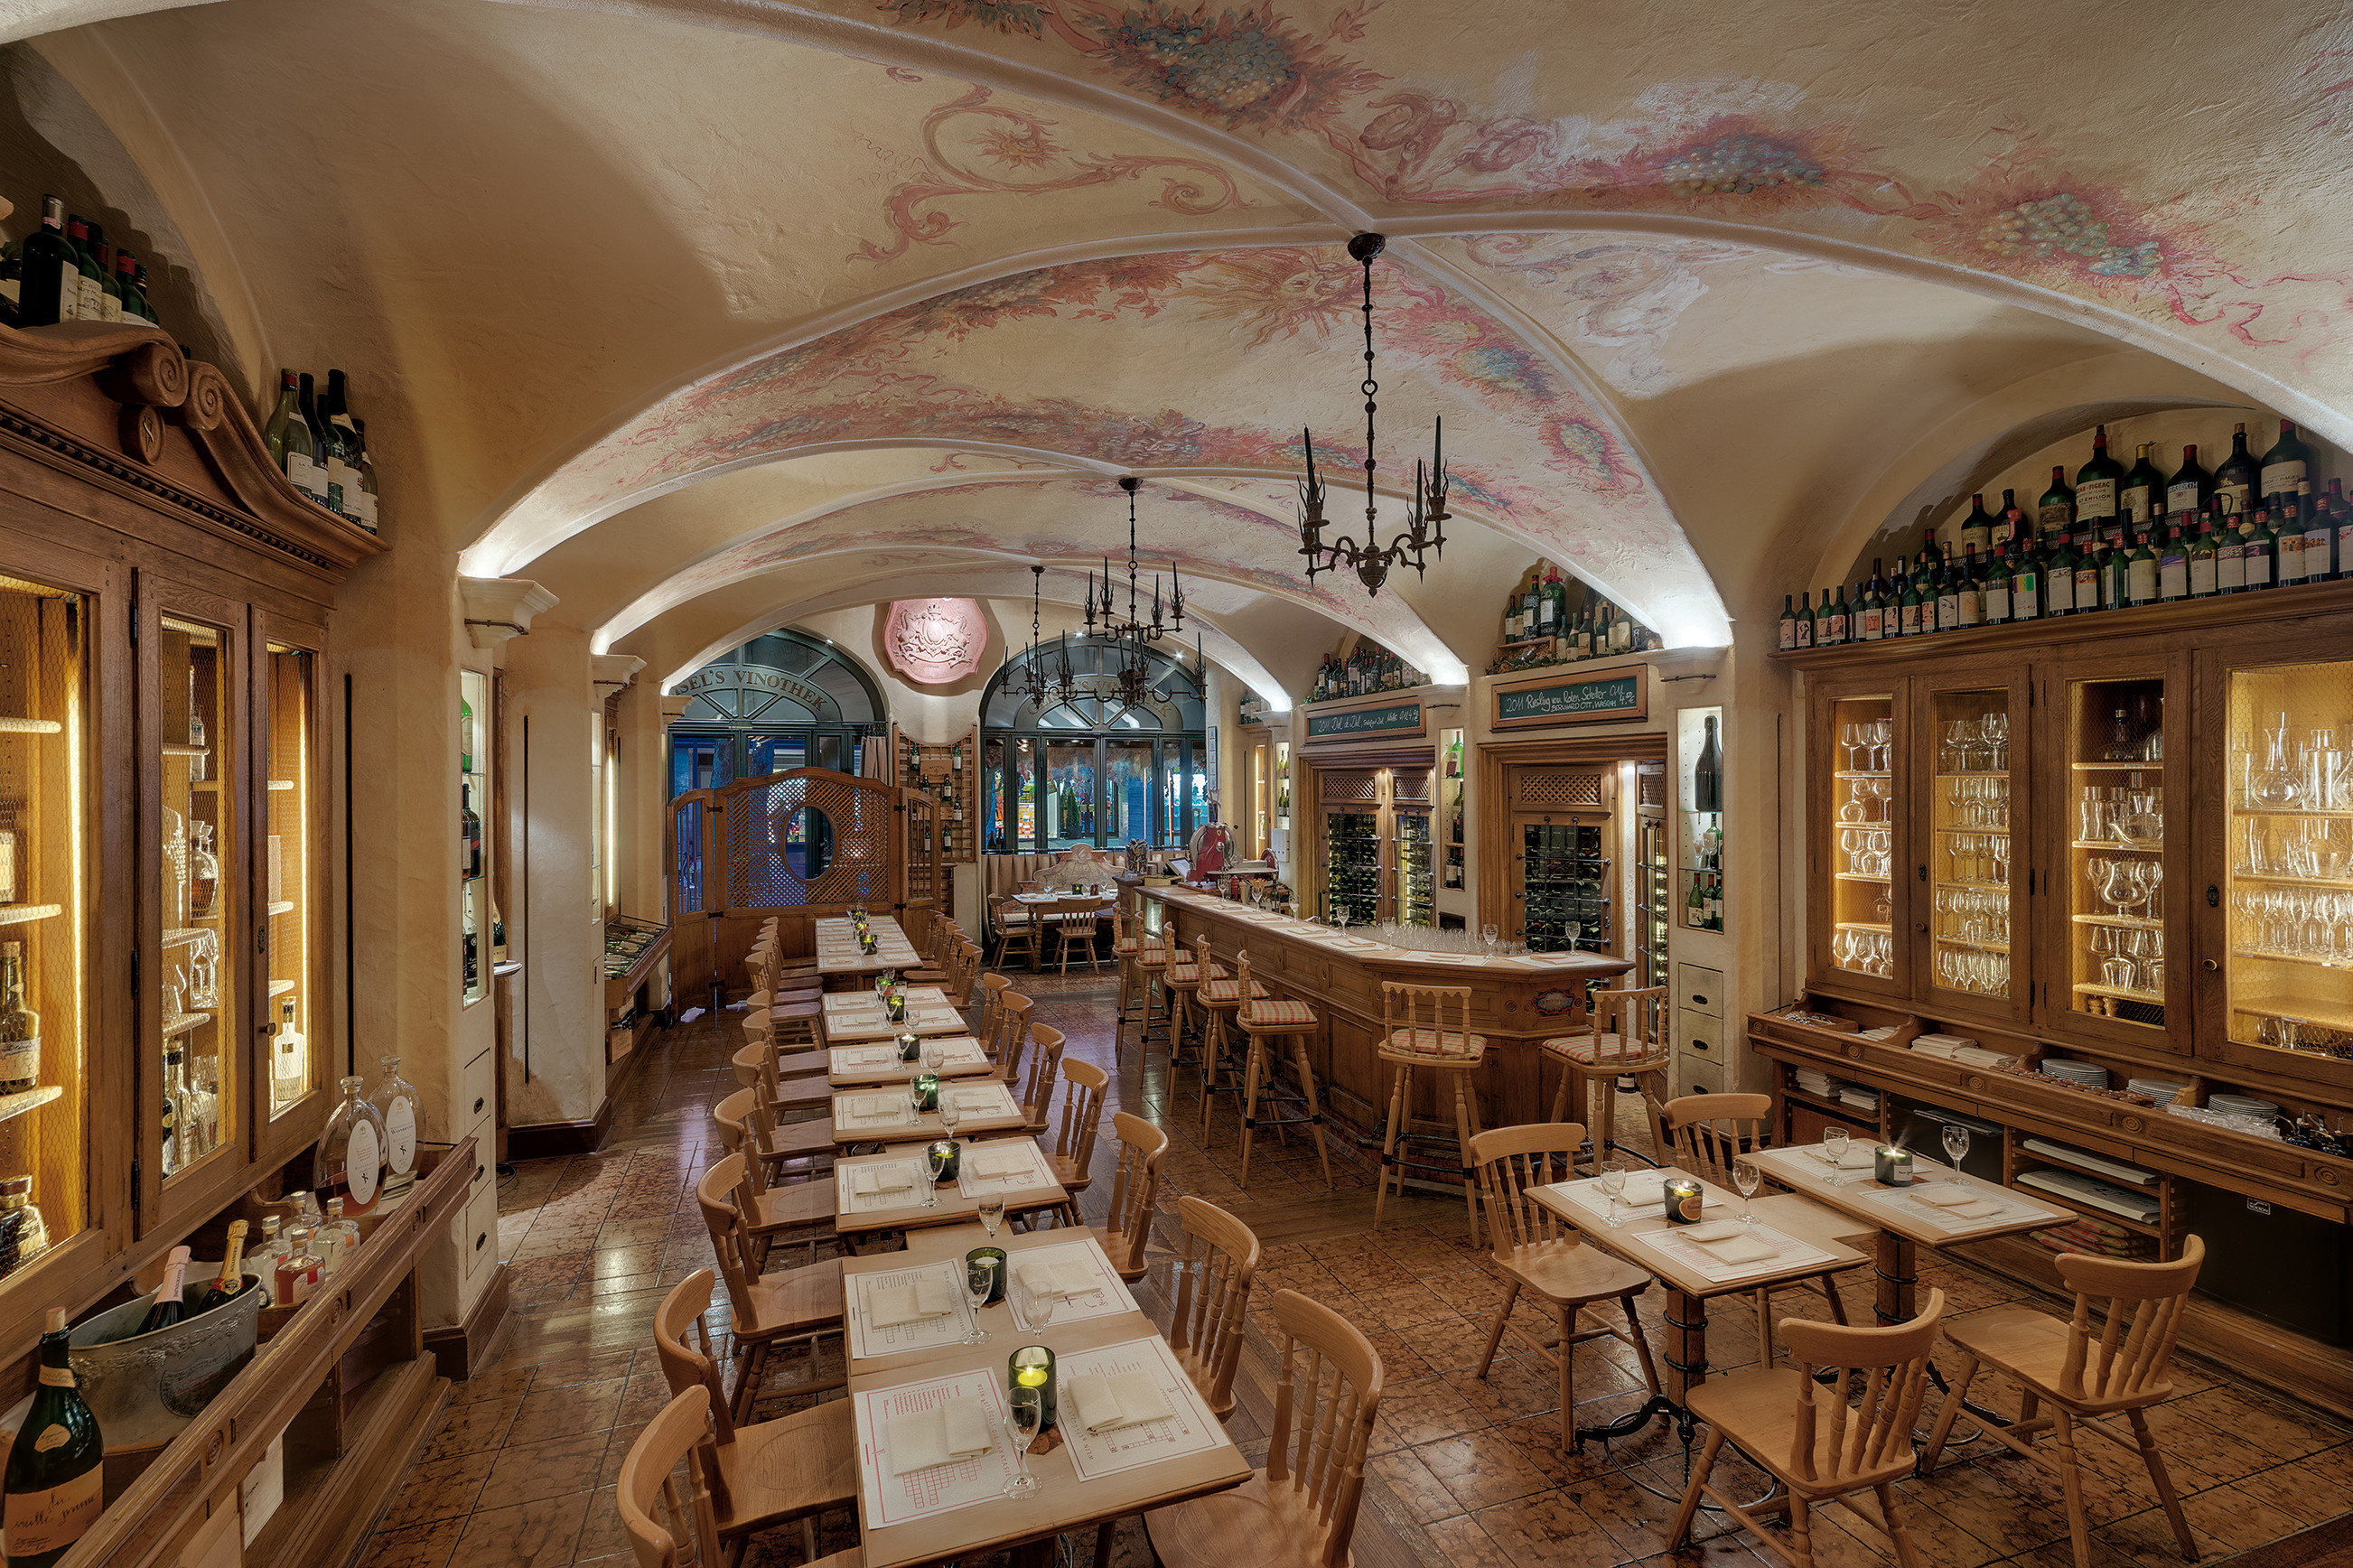 europe Germany Hotels Munich indoor interior design ceiling restaurant Lobby estate furniture several dining room